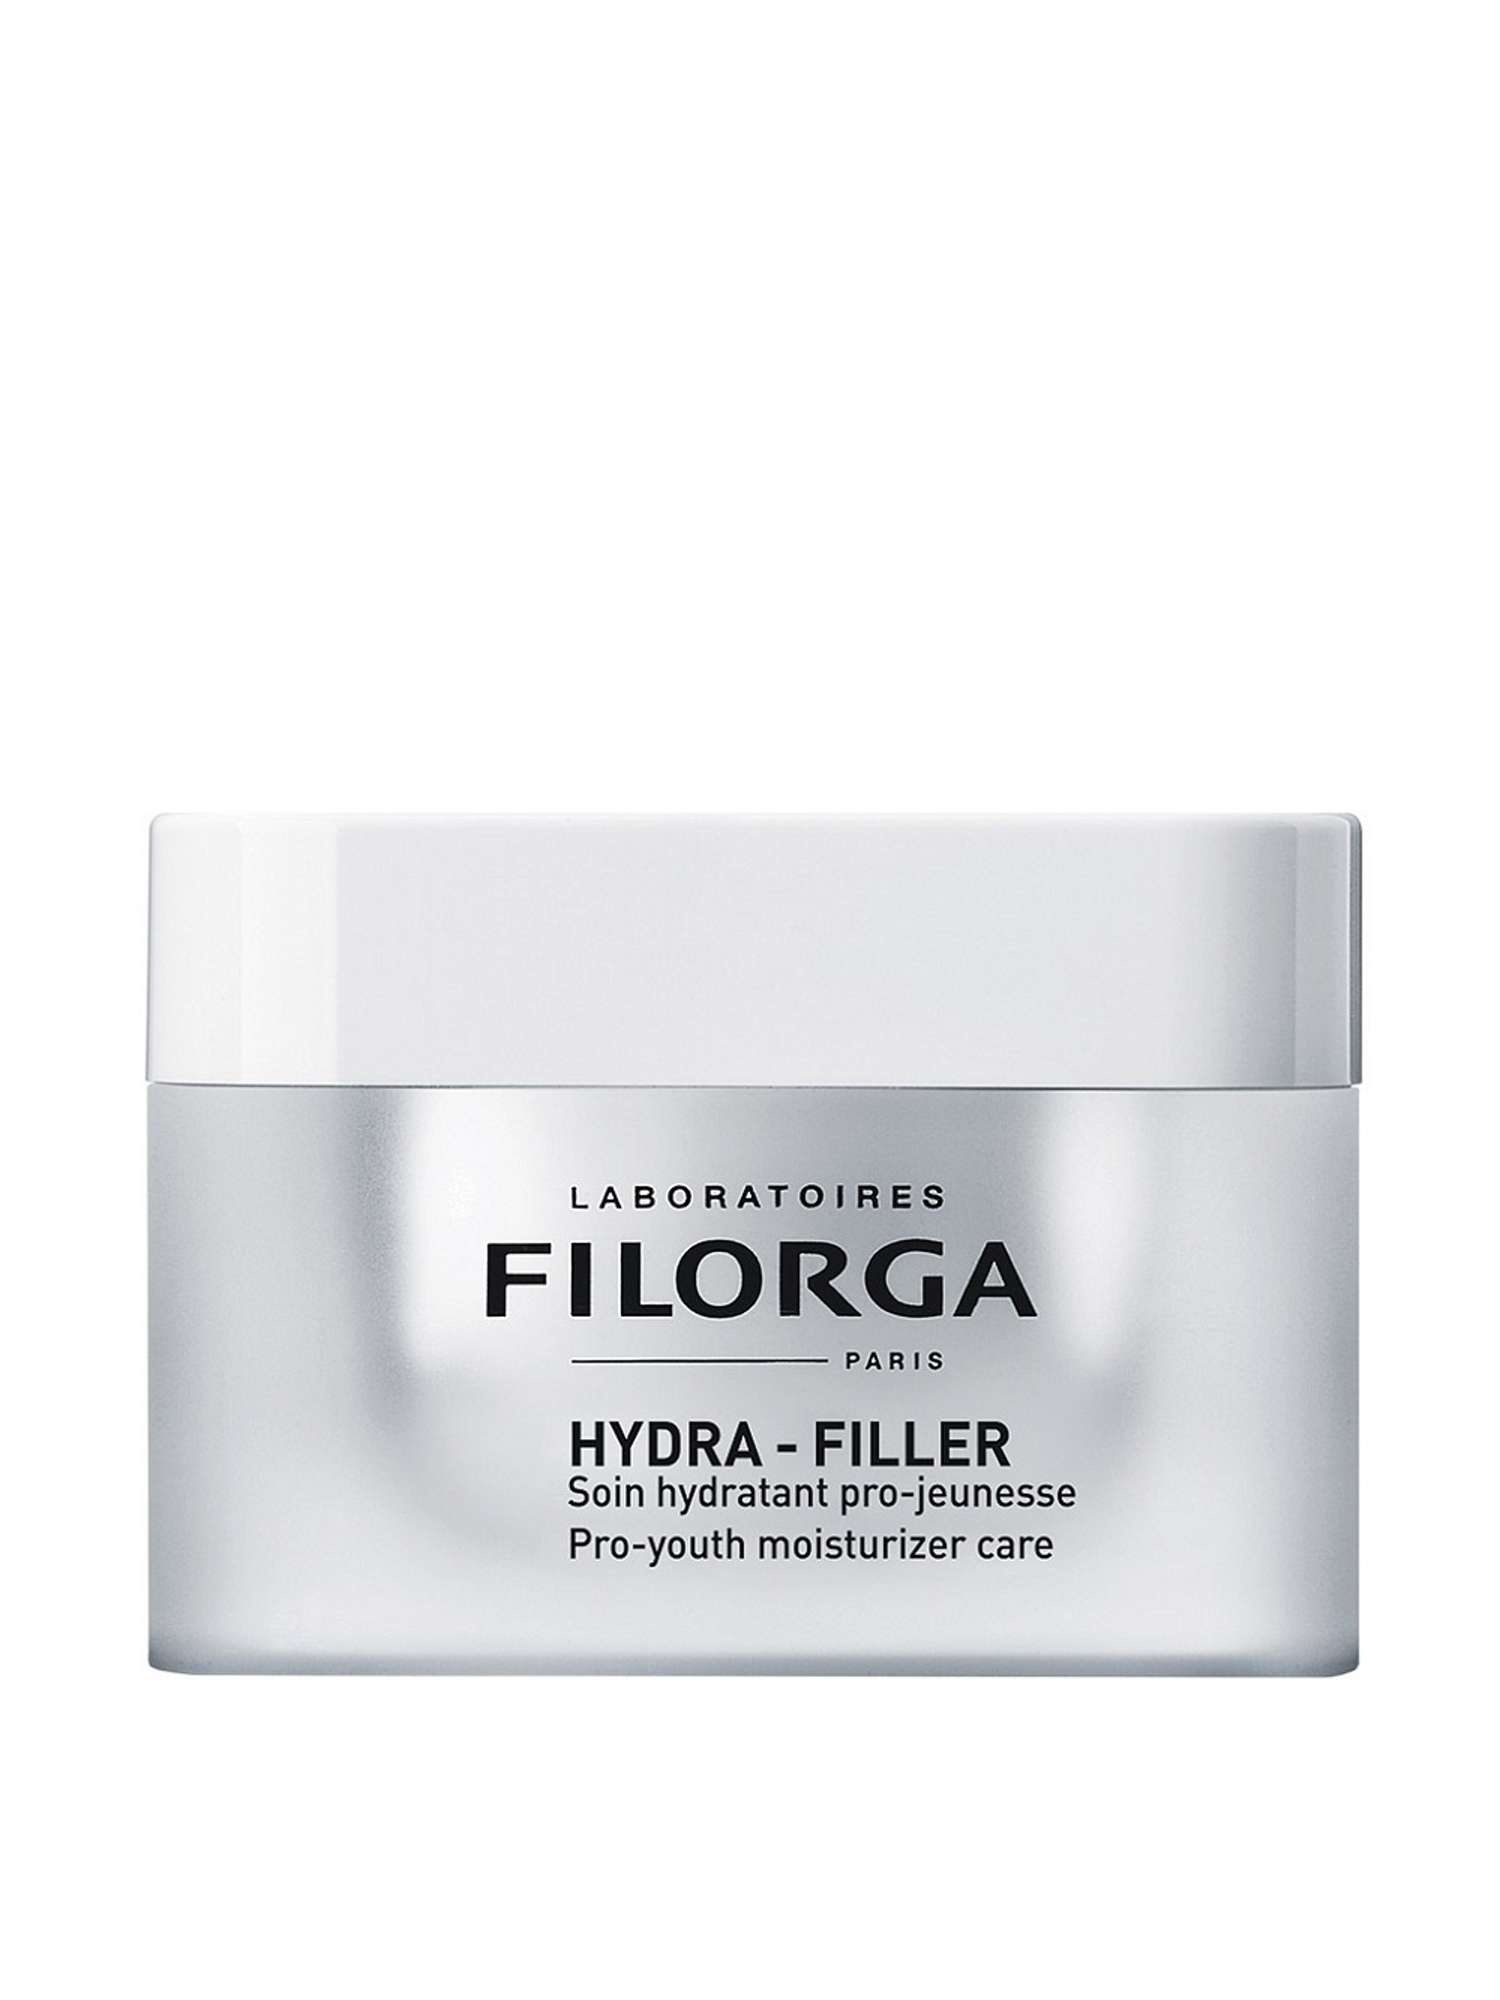 Filorga Hydra-Filler Pro-Youth Moisturiser care 50ml